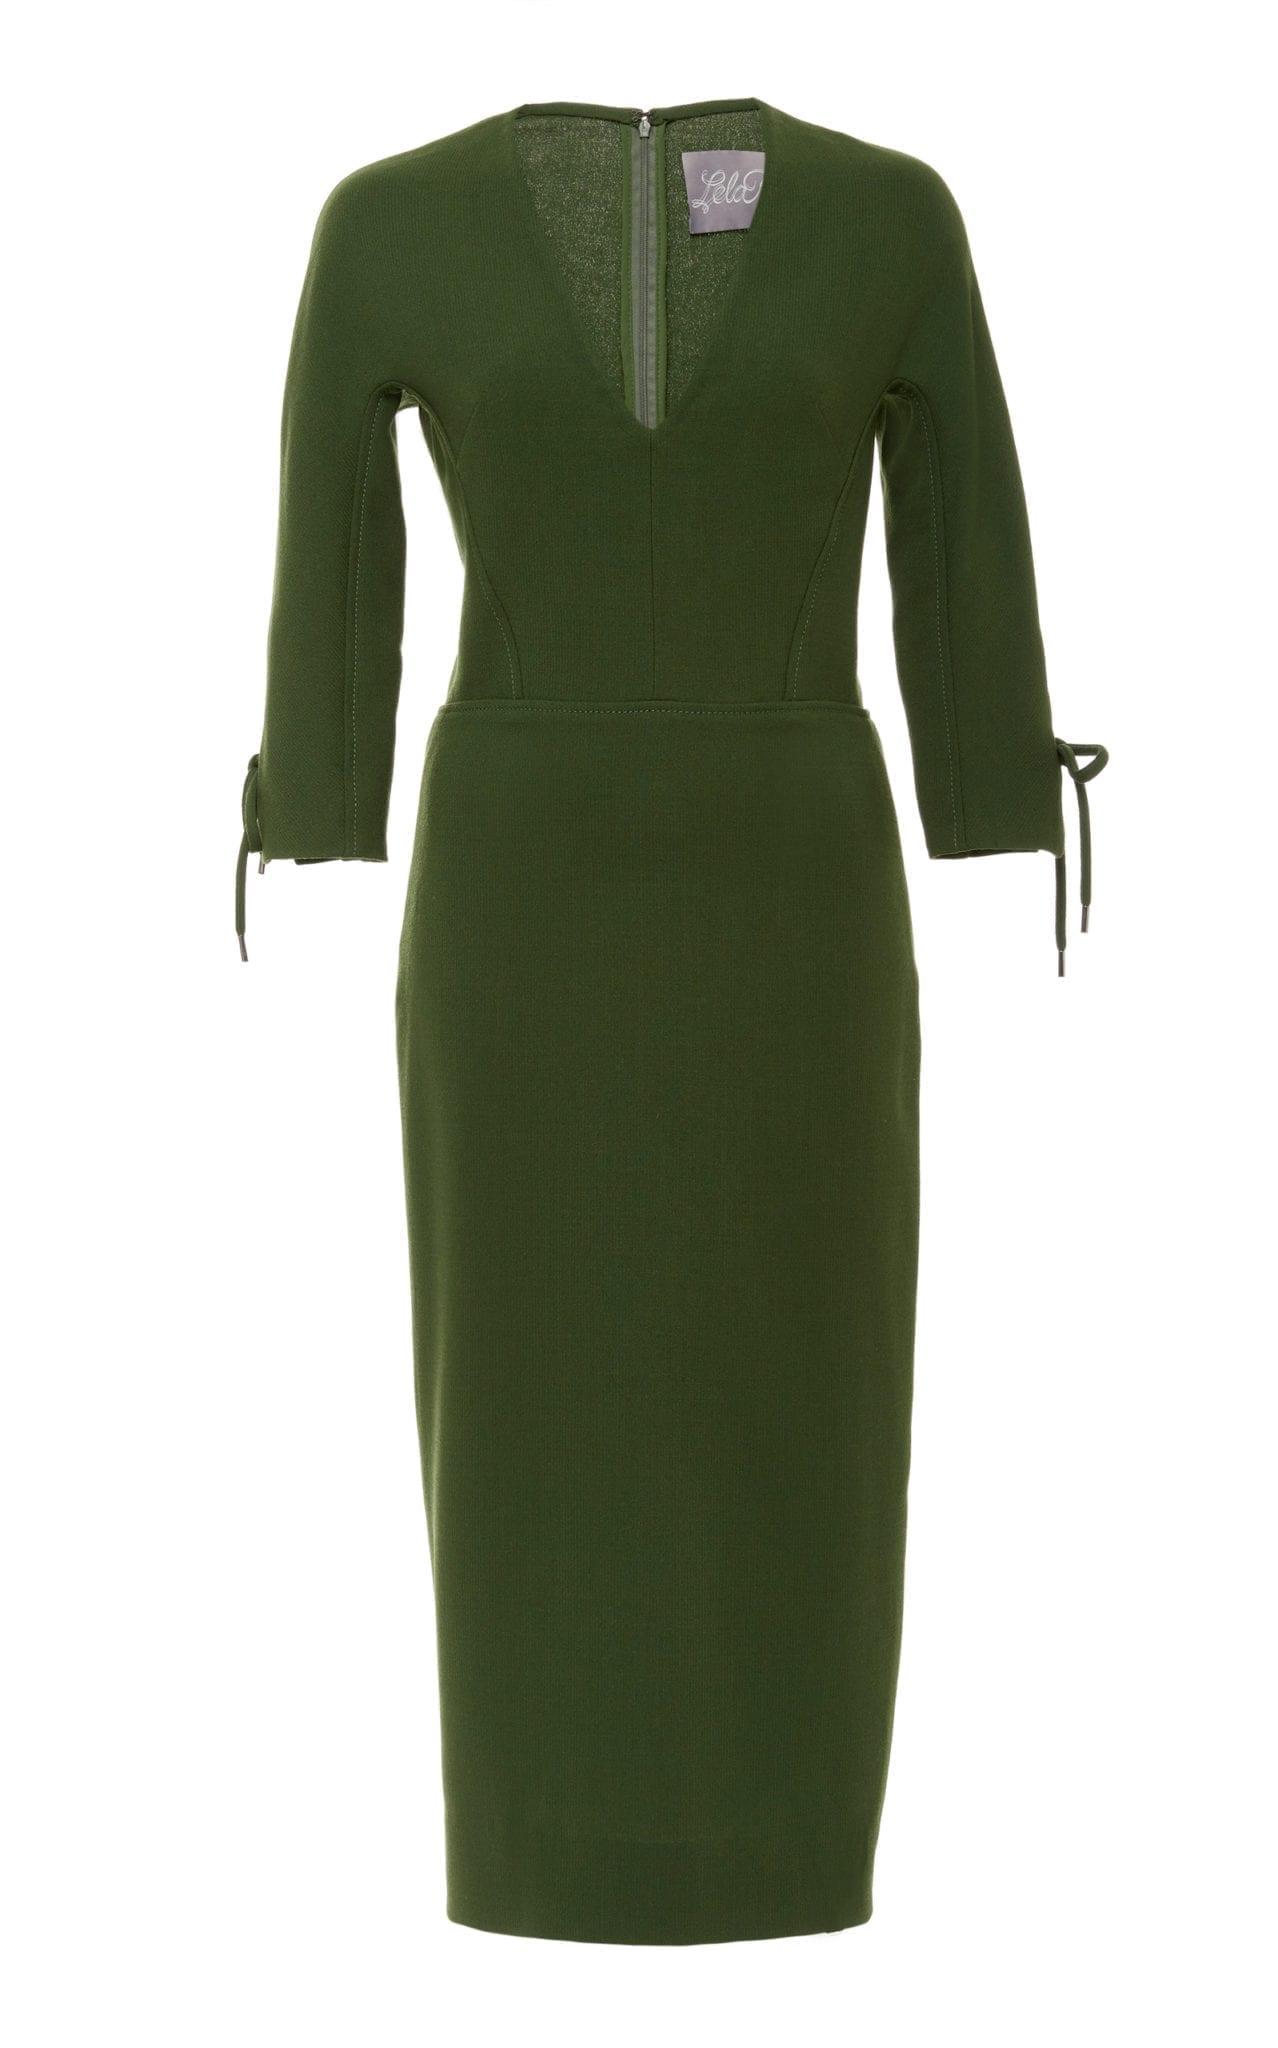 LELA ROSE Bow-Detailed Wool-Blend Cady Midi Green Dress